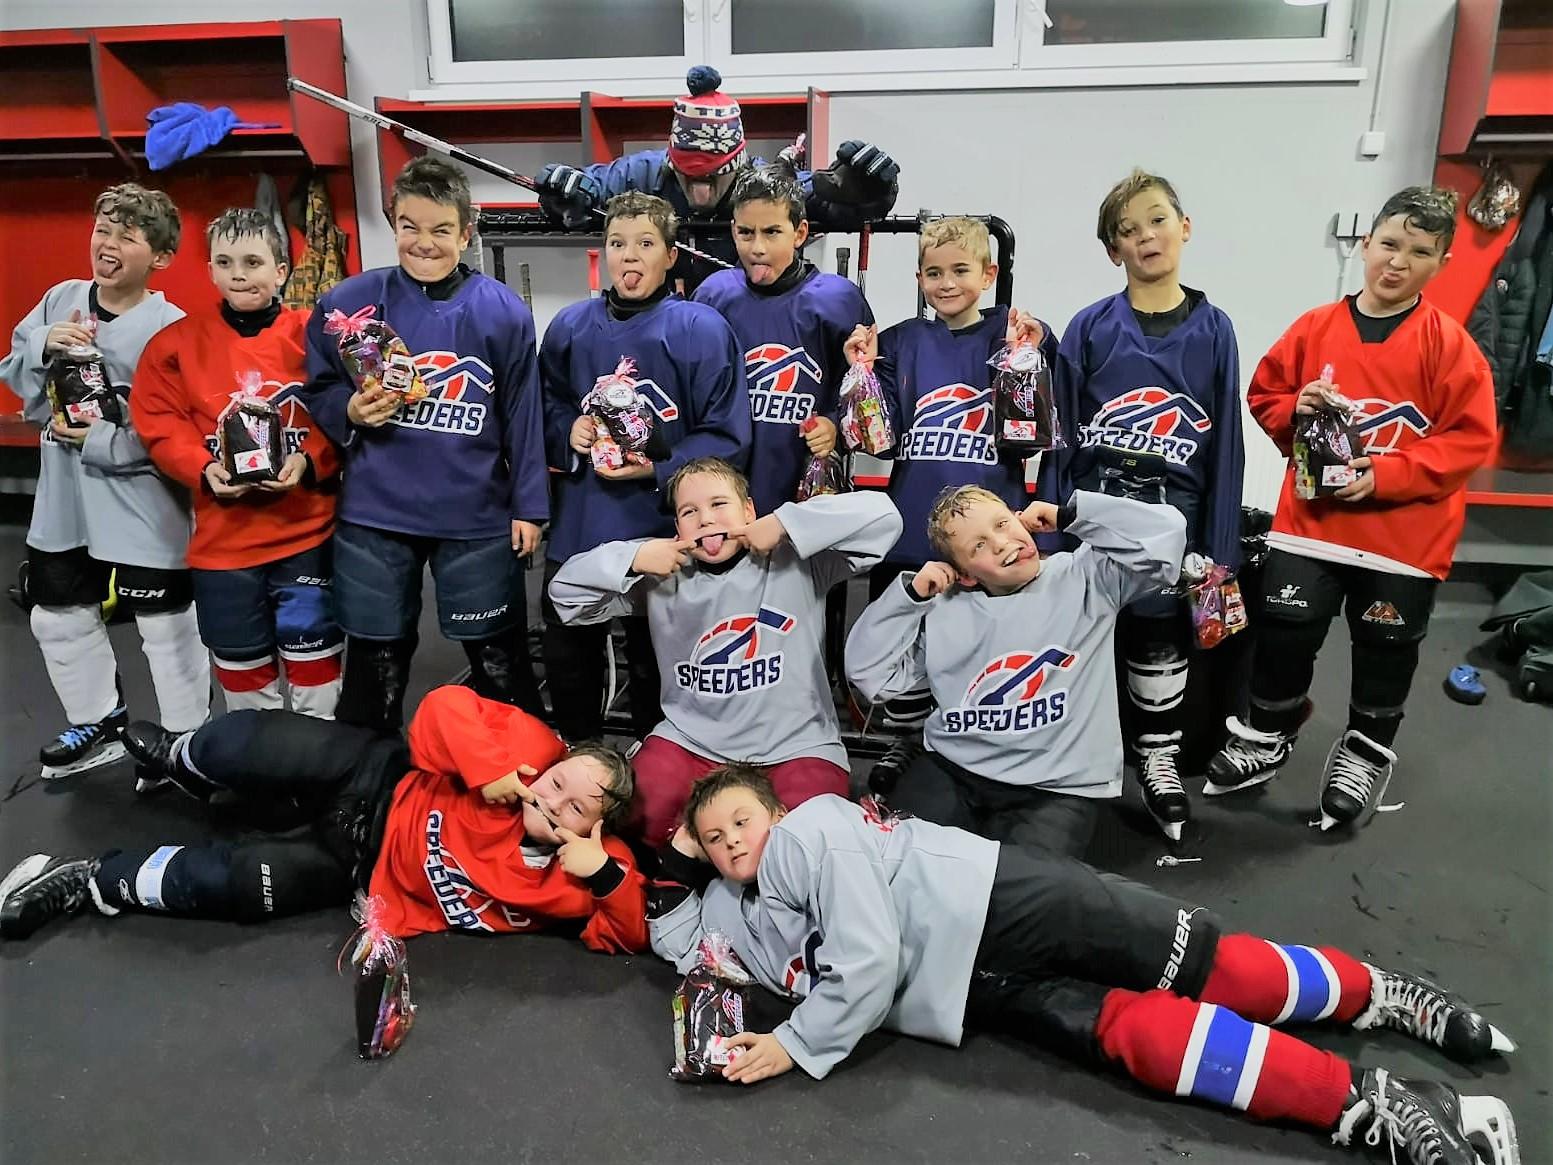 Speeders Hokejovy milulas na lade zimak petrzalka19